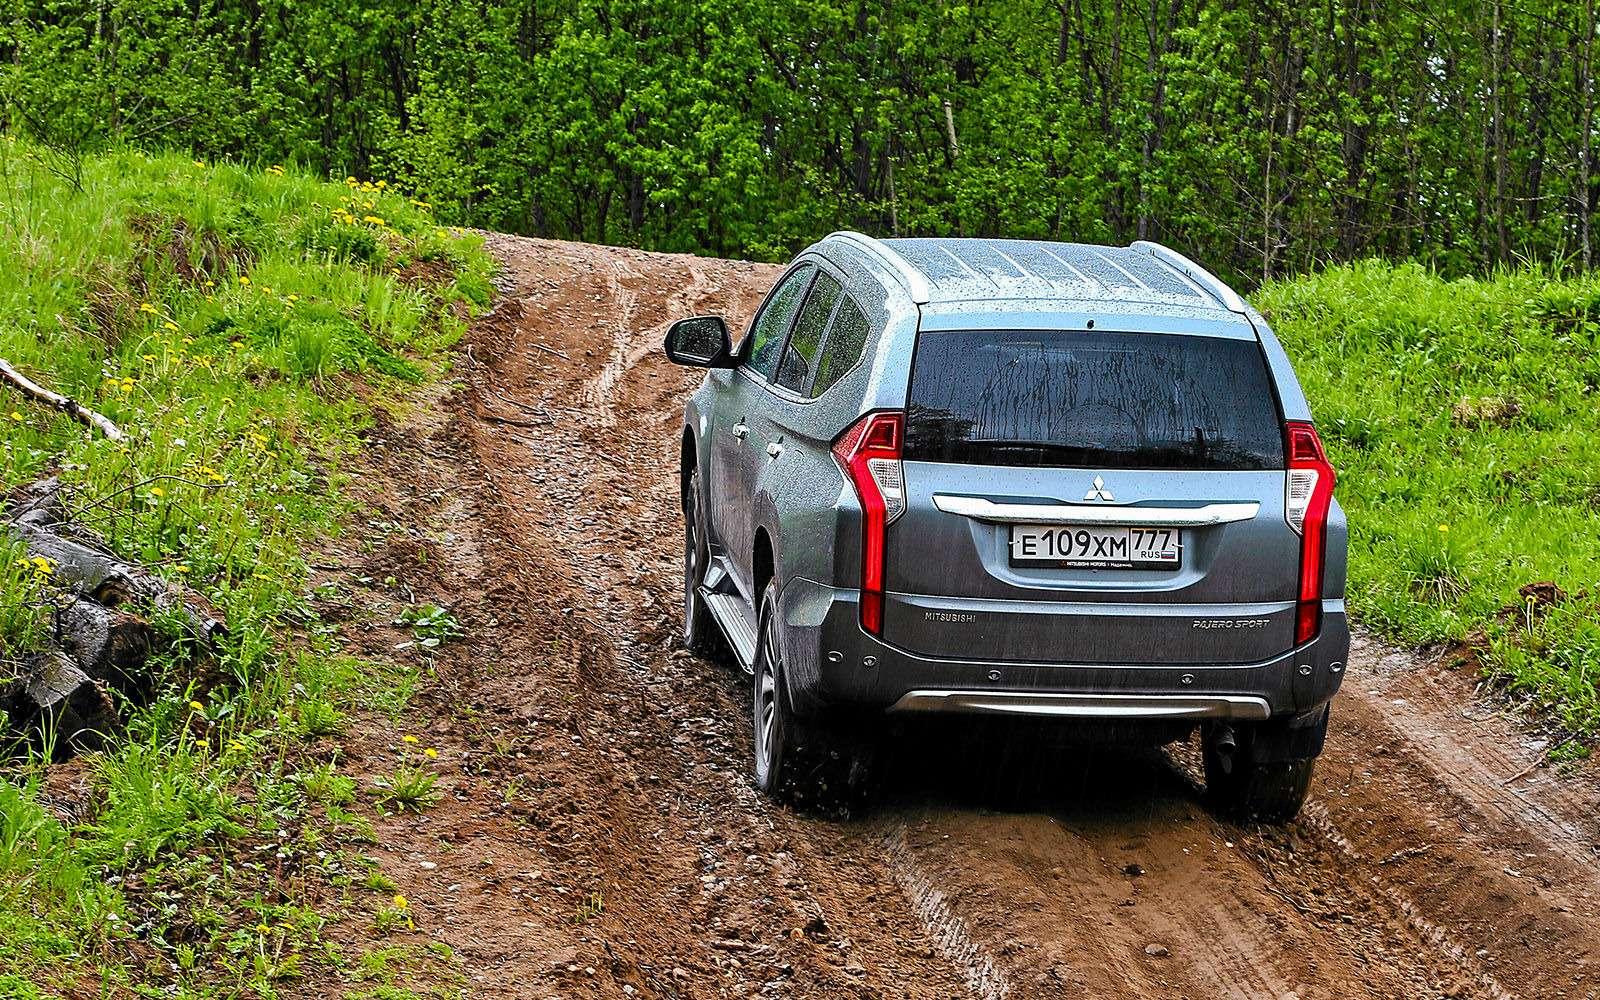 Mitsubishi Pajero Sport иKia Mohave— сравнительный тест настоящих внедорожников— фото 769871